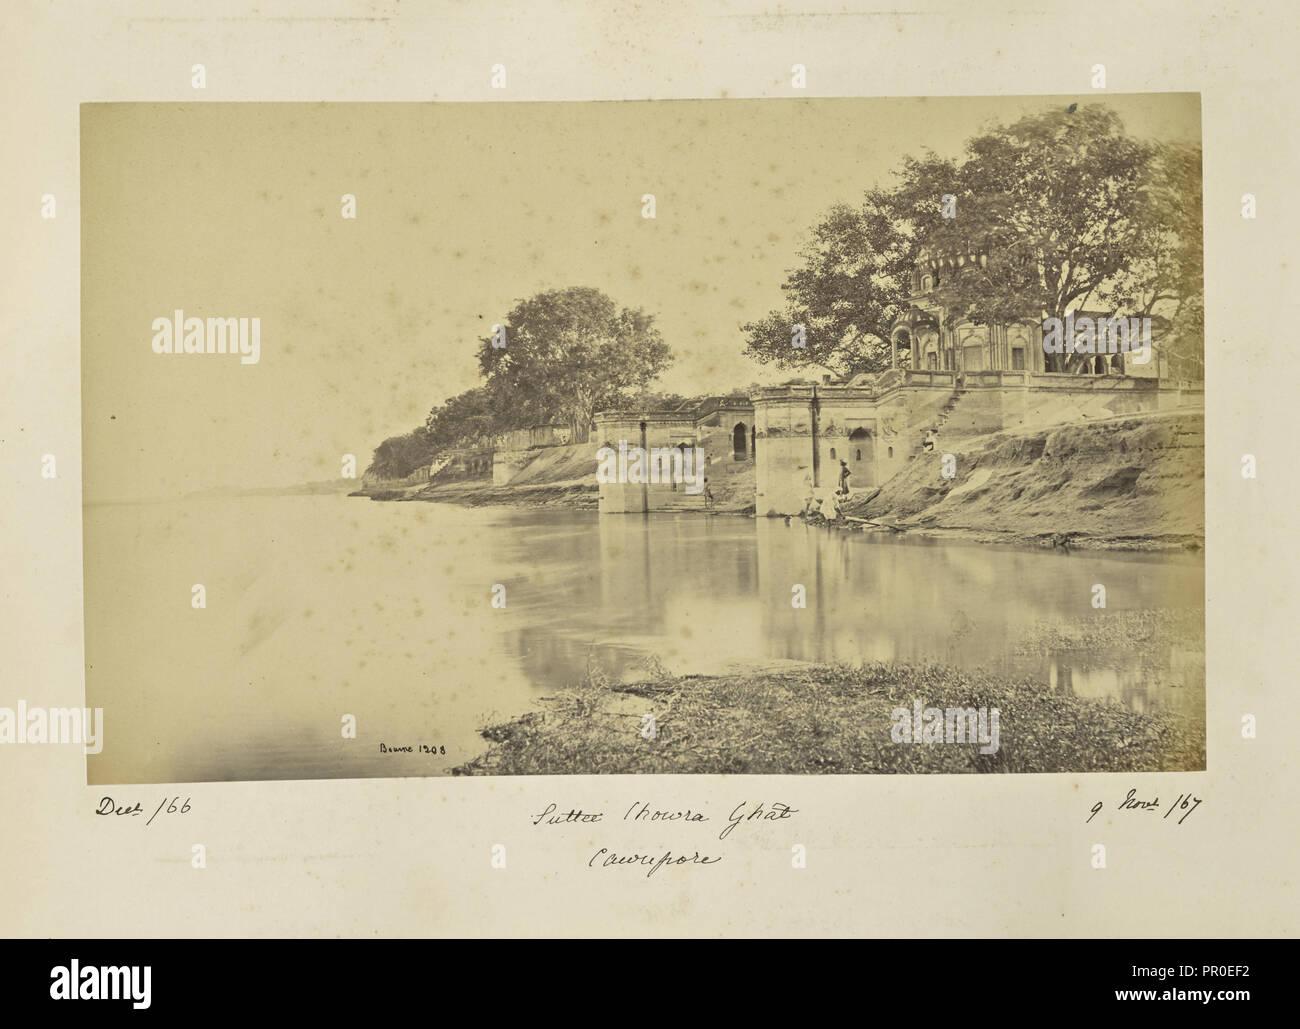 Cawnpore; Sutí Chowra Ghat, la escena de la masacre; Samuel Bourne, inglés, 1834 - 1912, Kānpur, Uttar Pradesh, India Foto de stock